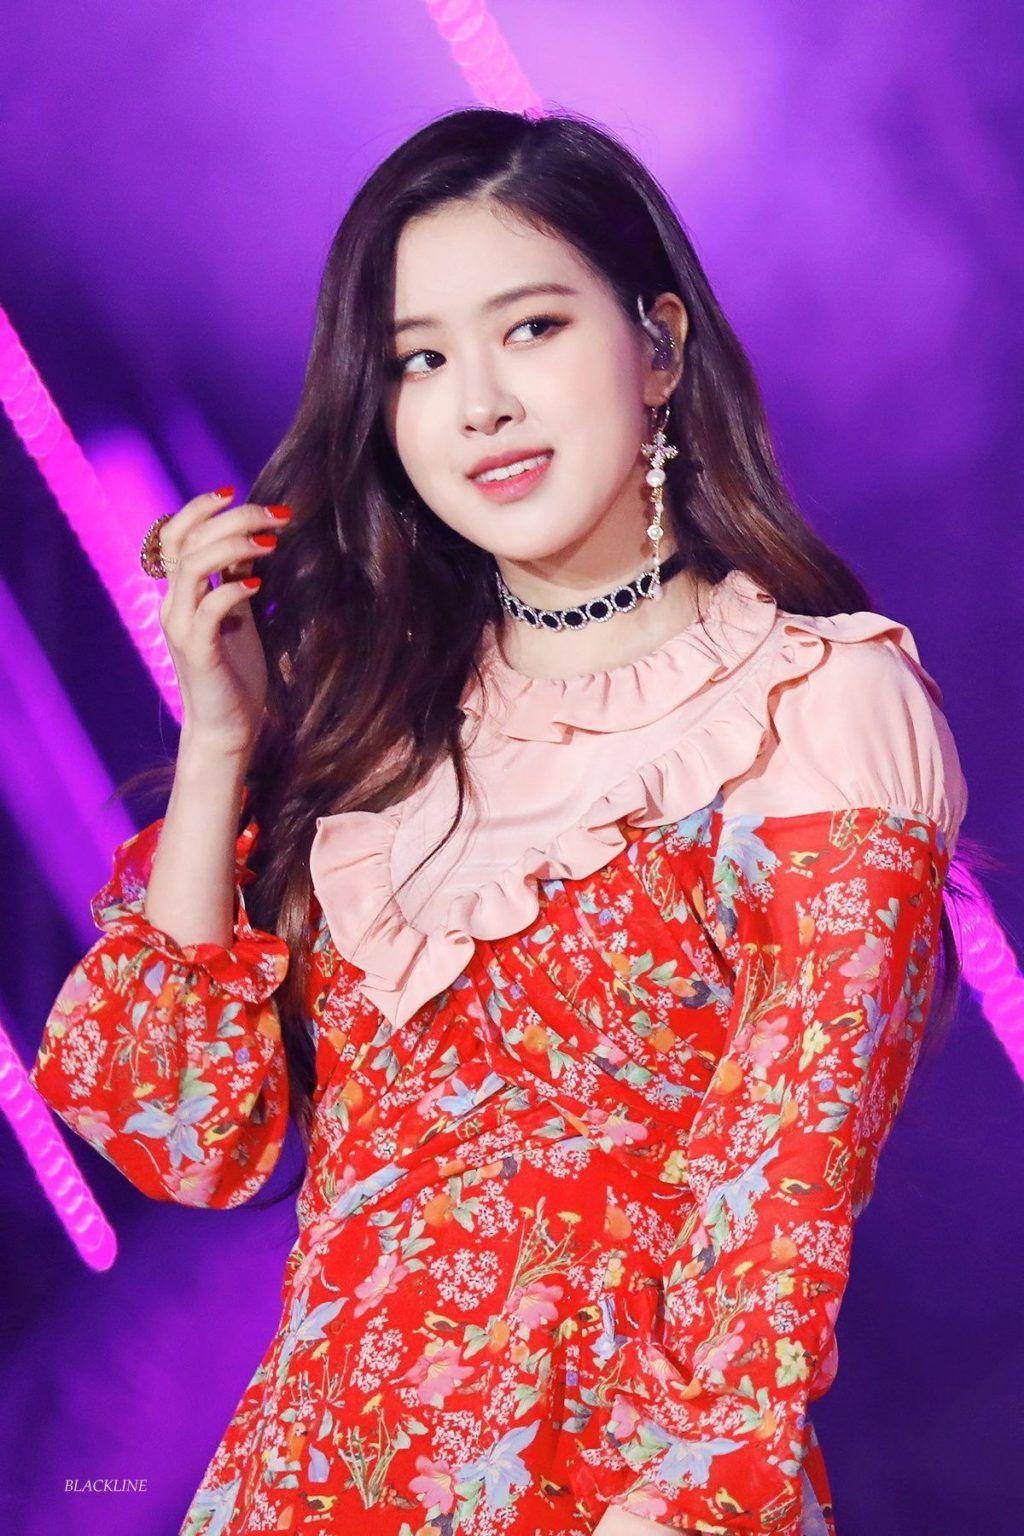 Rose Blackpink Wallpaper Rose Blackpink Wallpaper 2020 In 2020 Blackpink Rose Blackpink Girl Crushes